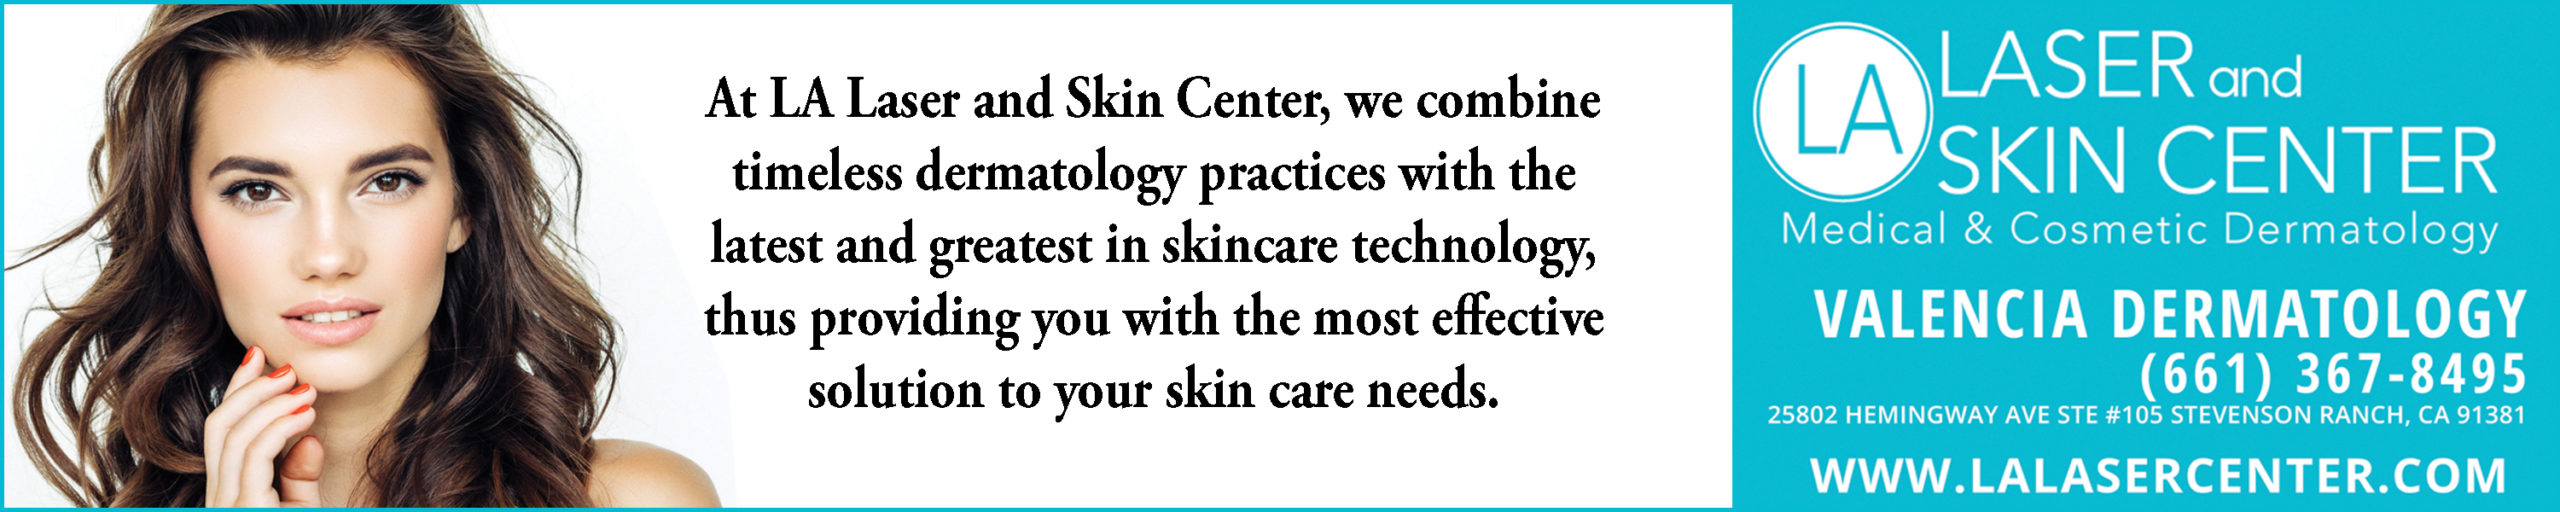 Valencia Dermatology Web AD TOP